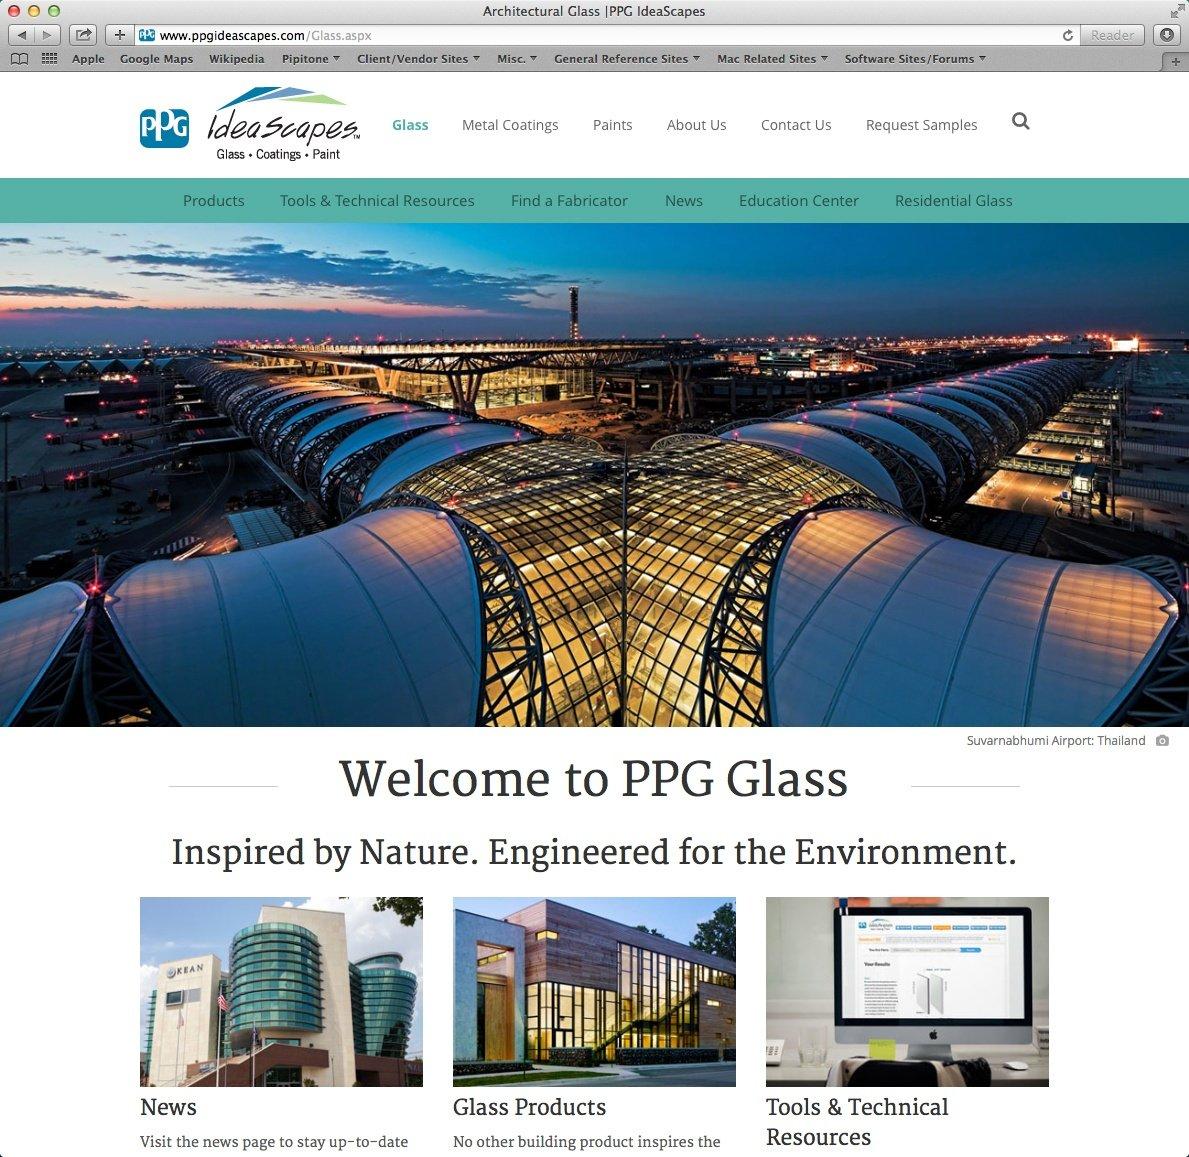 PPG-ReflectiveGlass_new